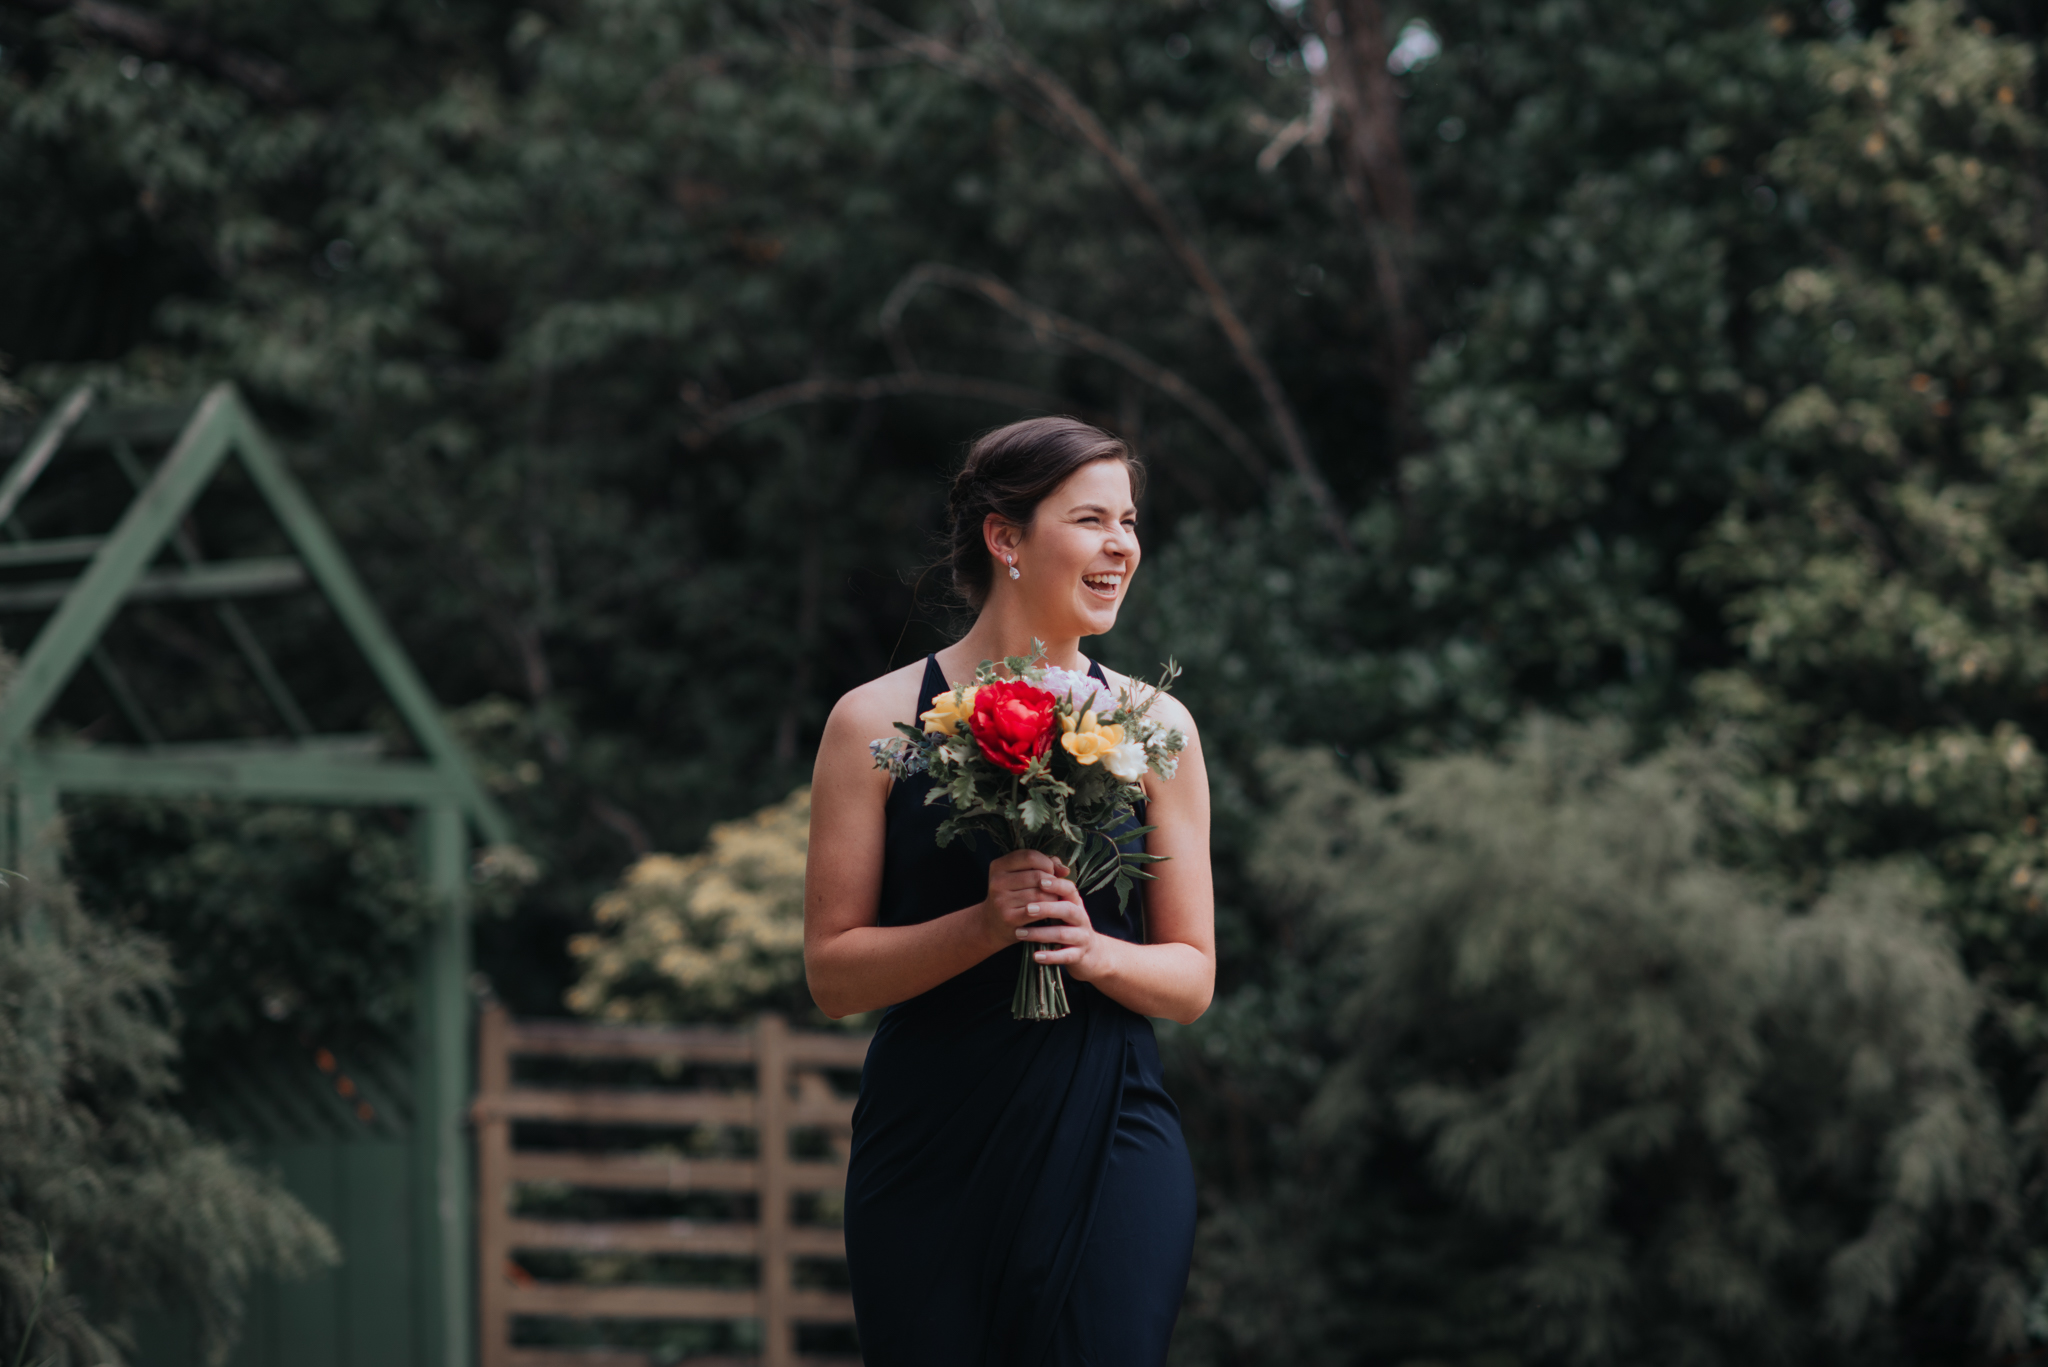 LOVELENSCAPES PHOTOGRAPHY • VISUAL POETRY • NEW ZEALAND WEDDING PHOTOGRAPHER • AUSTRALIAN WEDDING PHOTOGRAPHER • BRISBANE • MELBOURNE • SYDNEY • HOBART • TARUREKA ESTATE • ANNA CAMPBELL • 103.jpg